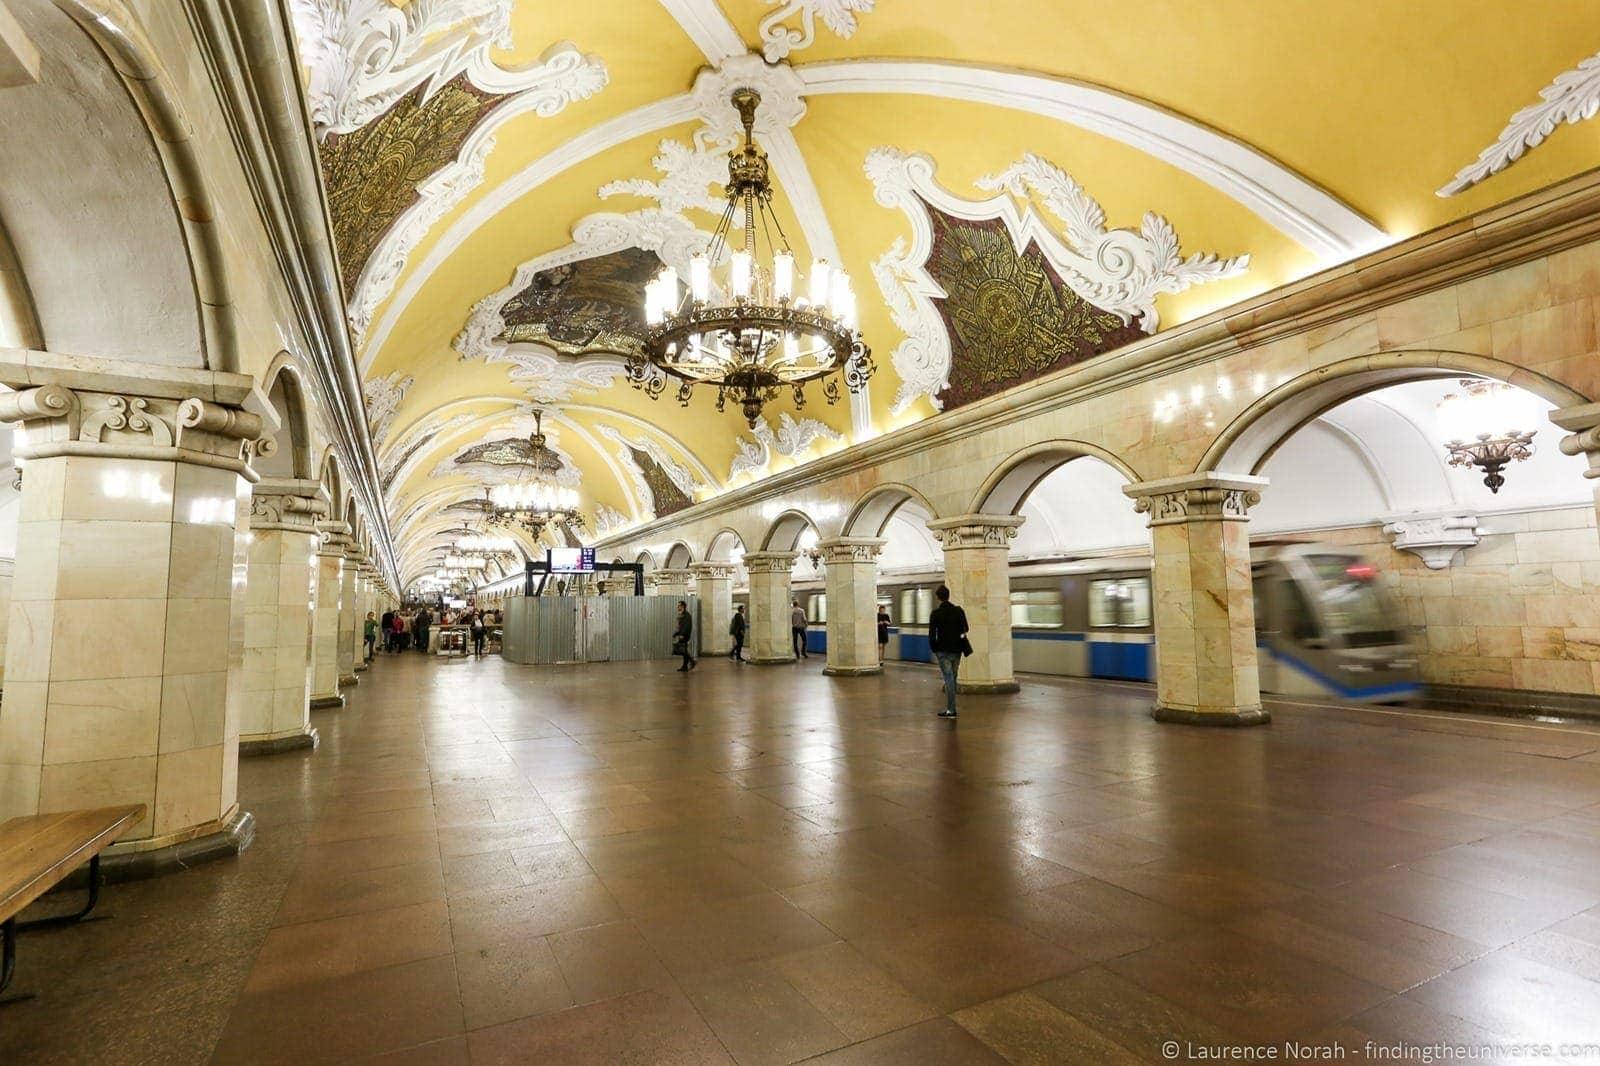 Russia river cruise Moscow tour underground subway metro 2